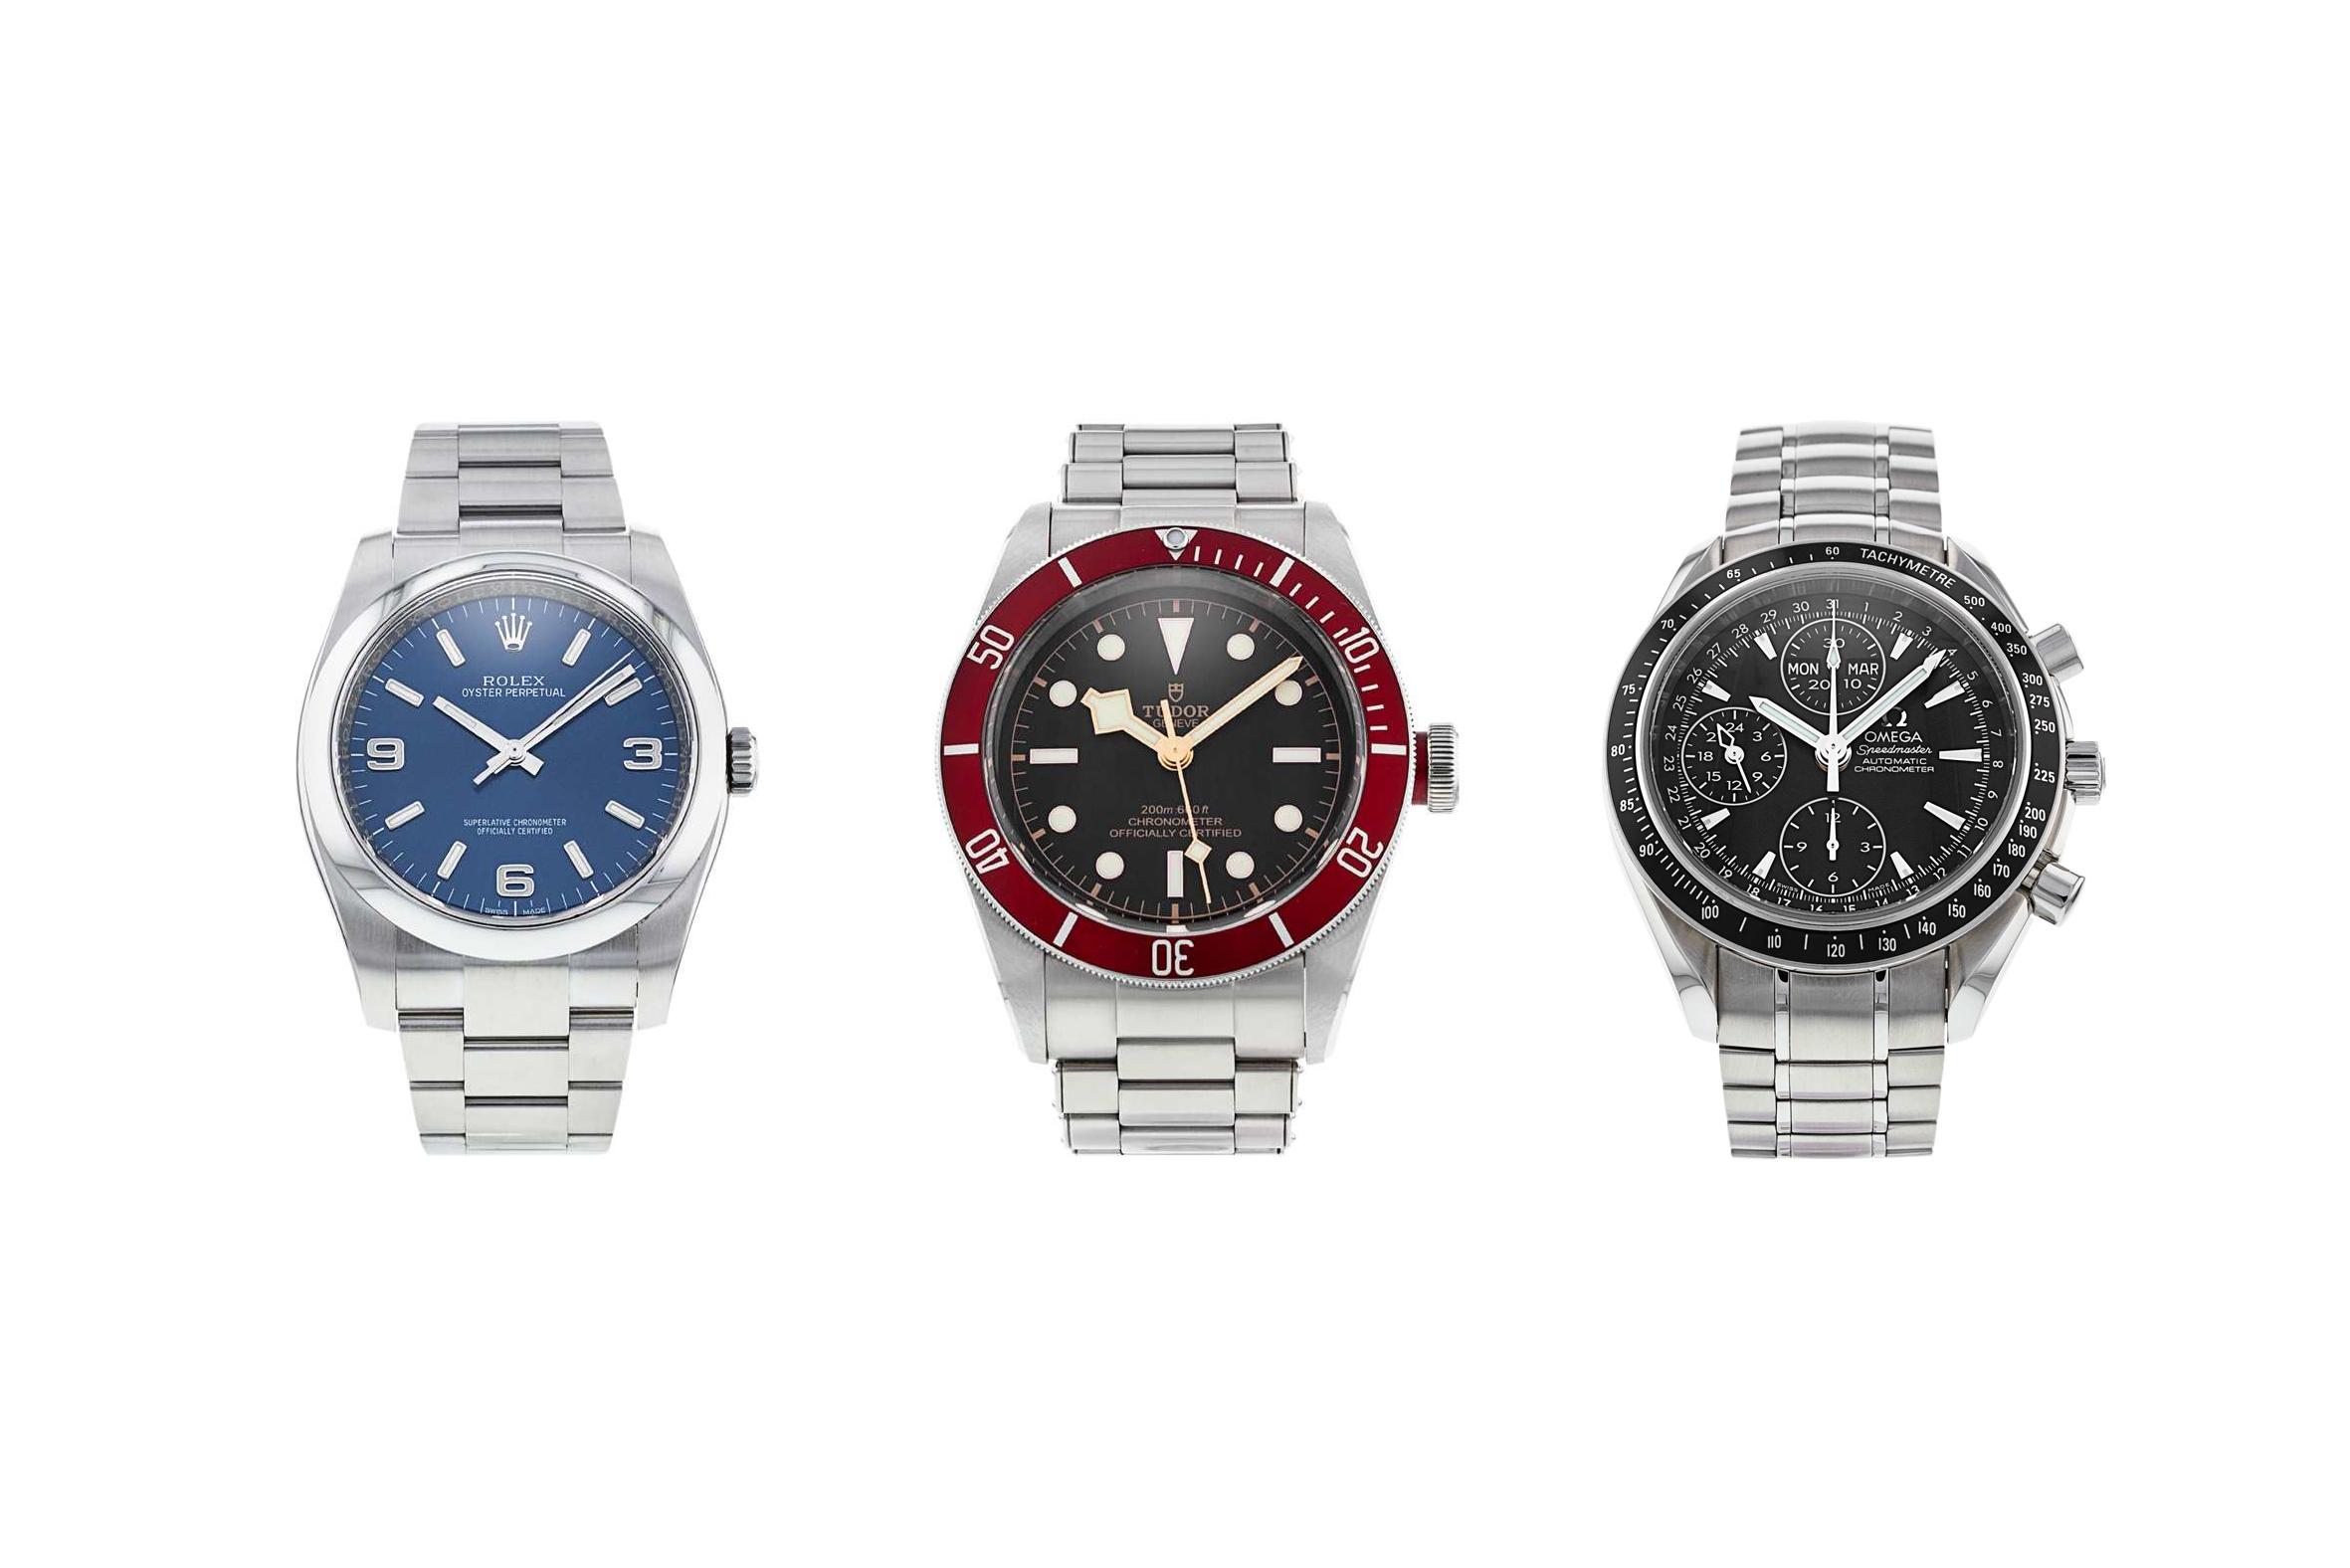 Rolex Perpetual, Tudor Black Bay and Omega Speedmaster